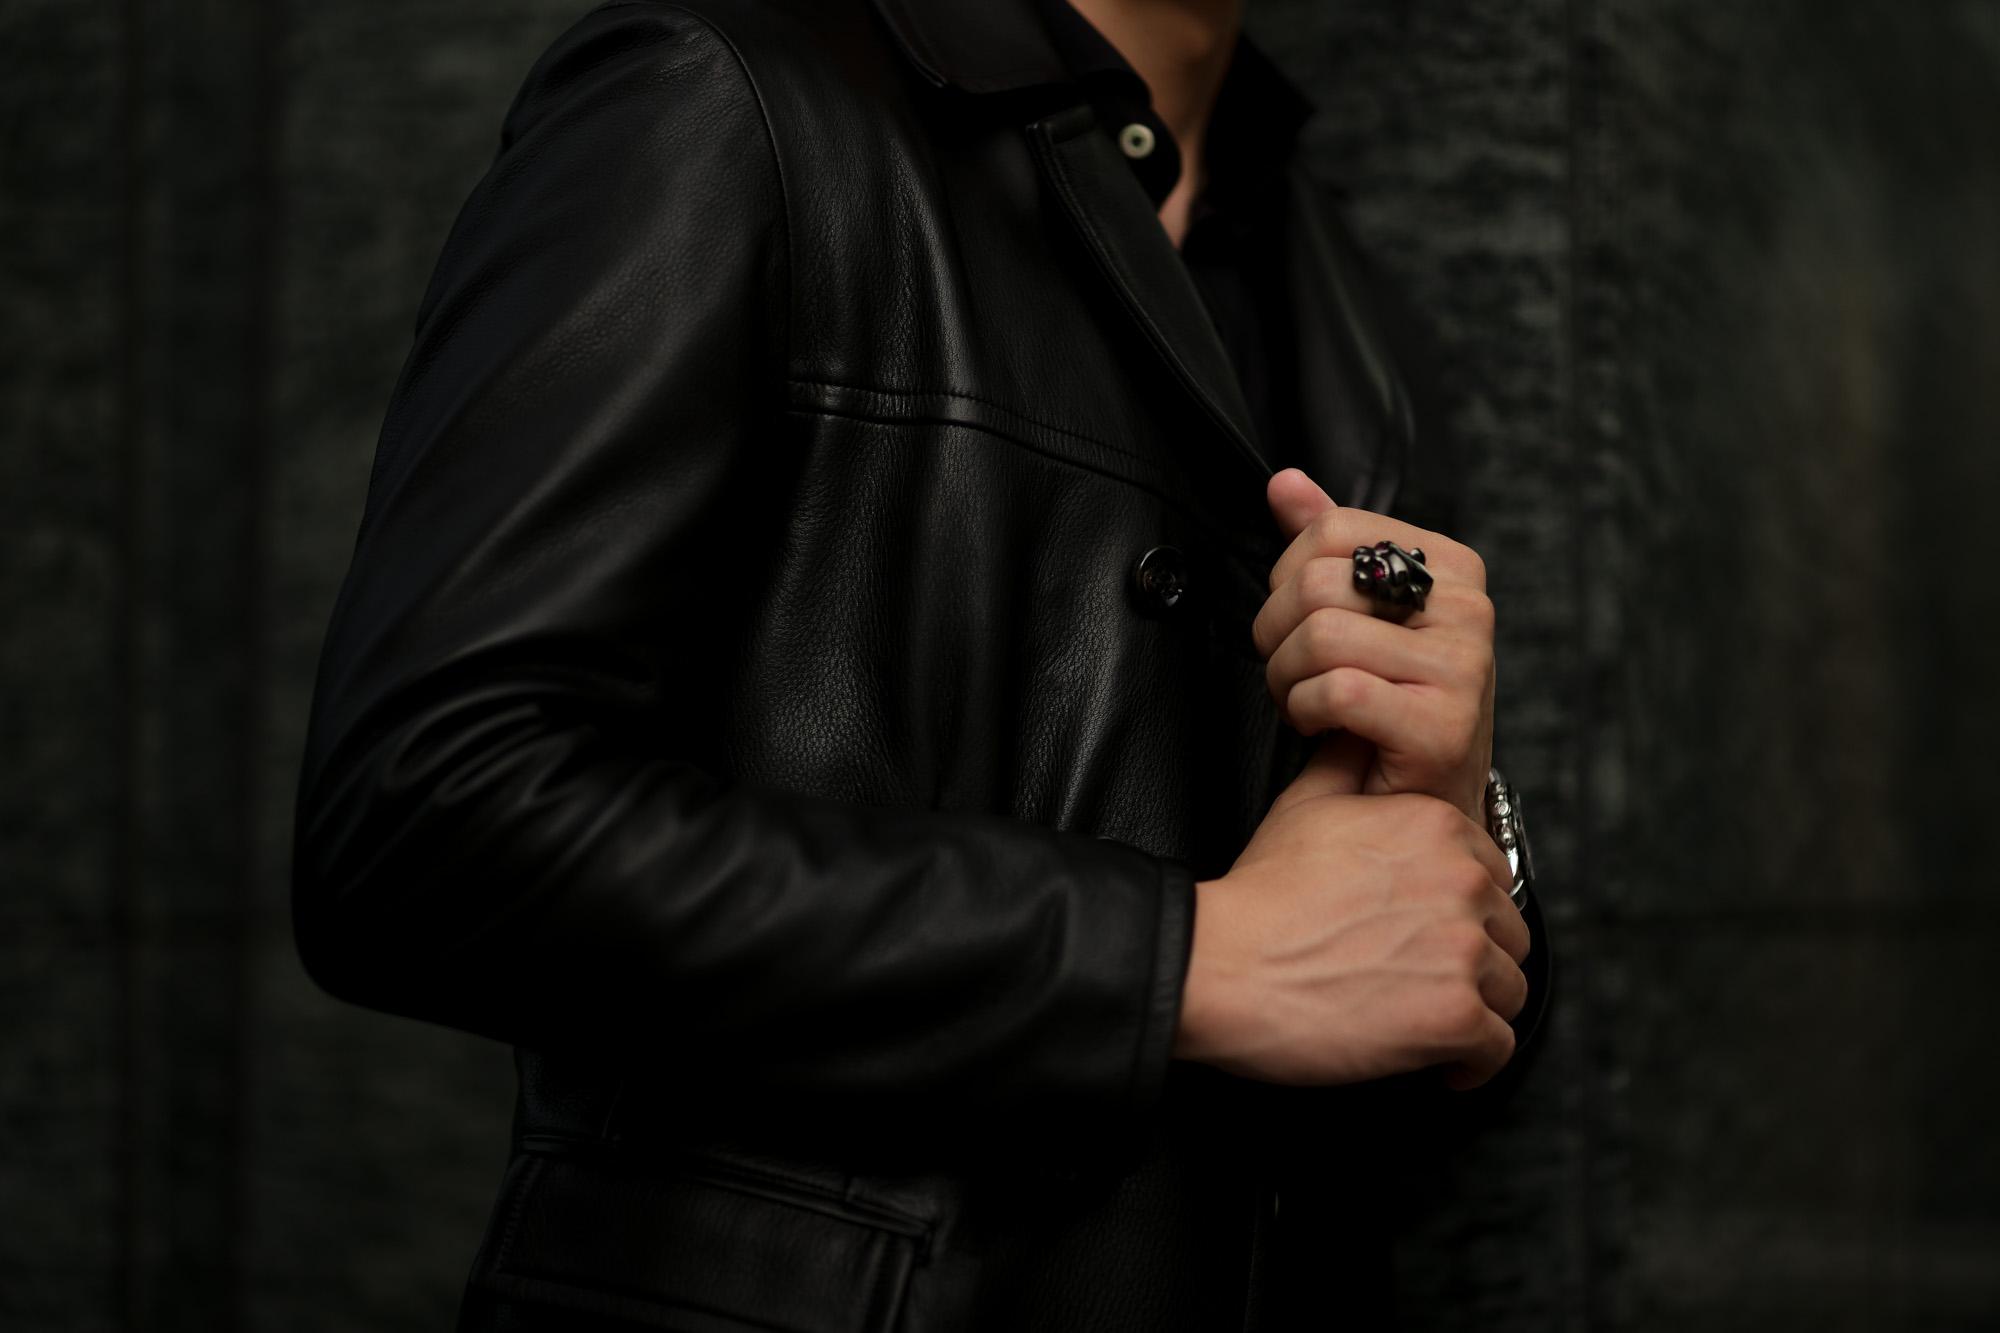 "FIXER(フィクサー) BLACK PANTHER RING ""RUBY"" BLACK RHODIUM(ブラック ロジウム) ブラック パンサーリング ルビー BLACK(ブラック) 2020 【ご予約開始】【2020.6.20(Sat)~2020.6.30(Tue)】 愛知 名古屋 altoediritto アルトエデリット イルミナティリング コーティング"